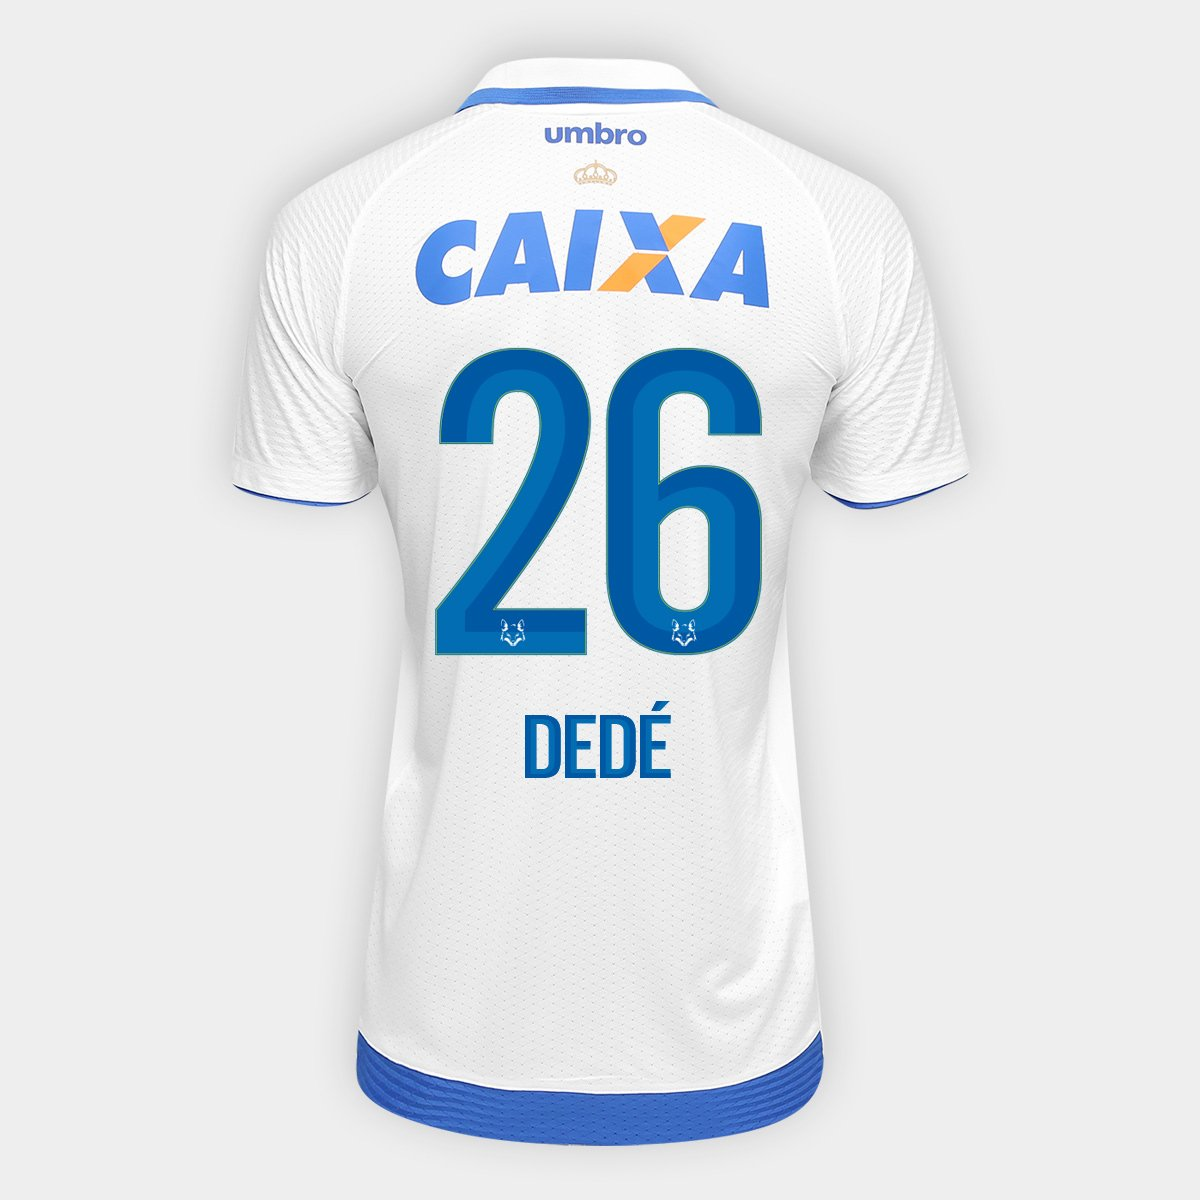 4c1b1987e2 Camisa Cruzeiro II 17/18 nº 26 - Dedé Torcedor Umbro Masculina   Netshoes